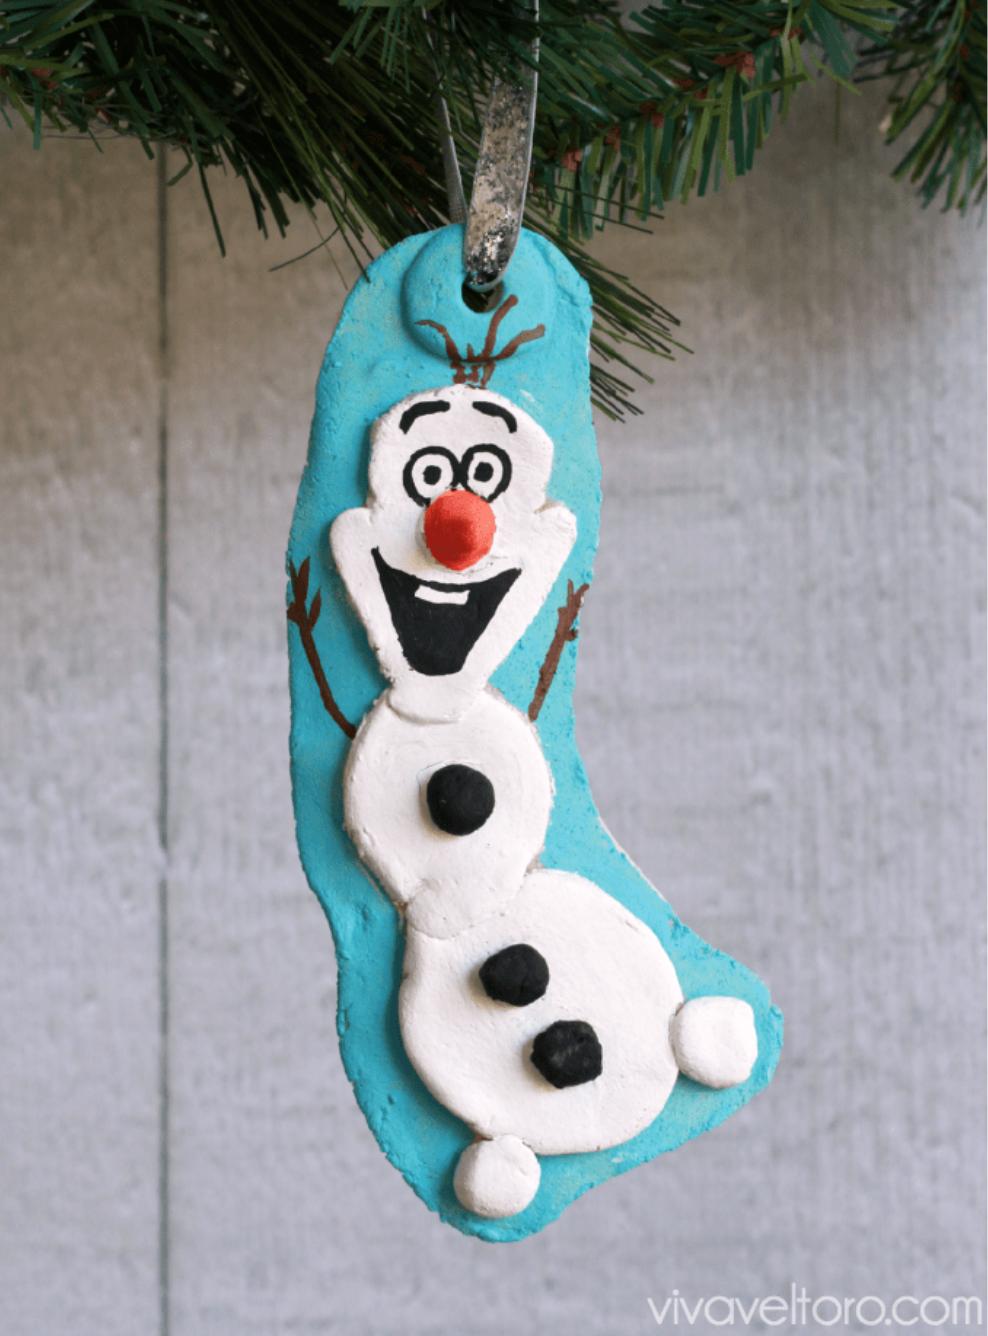 28 Diy Salt Dough Ornaments The Kids Will Love Making For Christmas Christmas Ornaments Homemade Christmas Ornaments Kids Ornaments